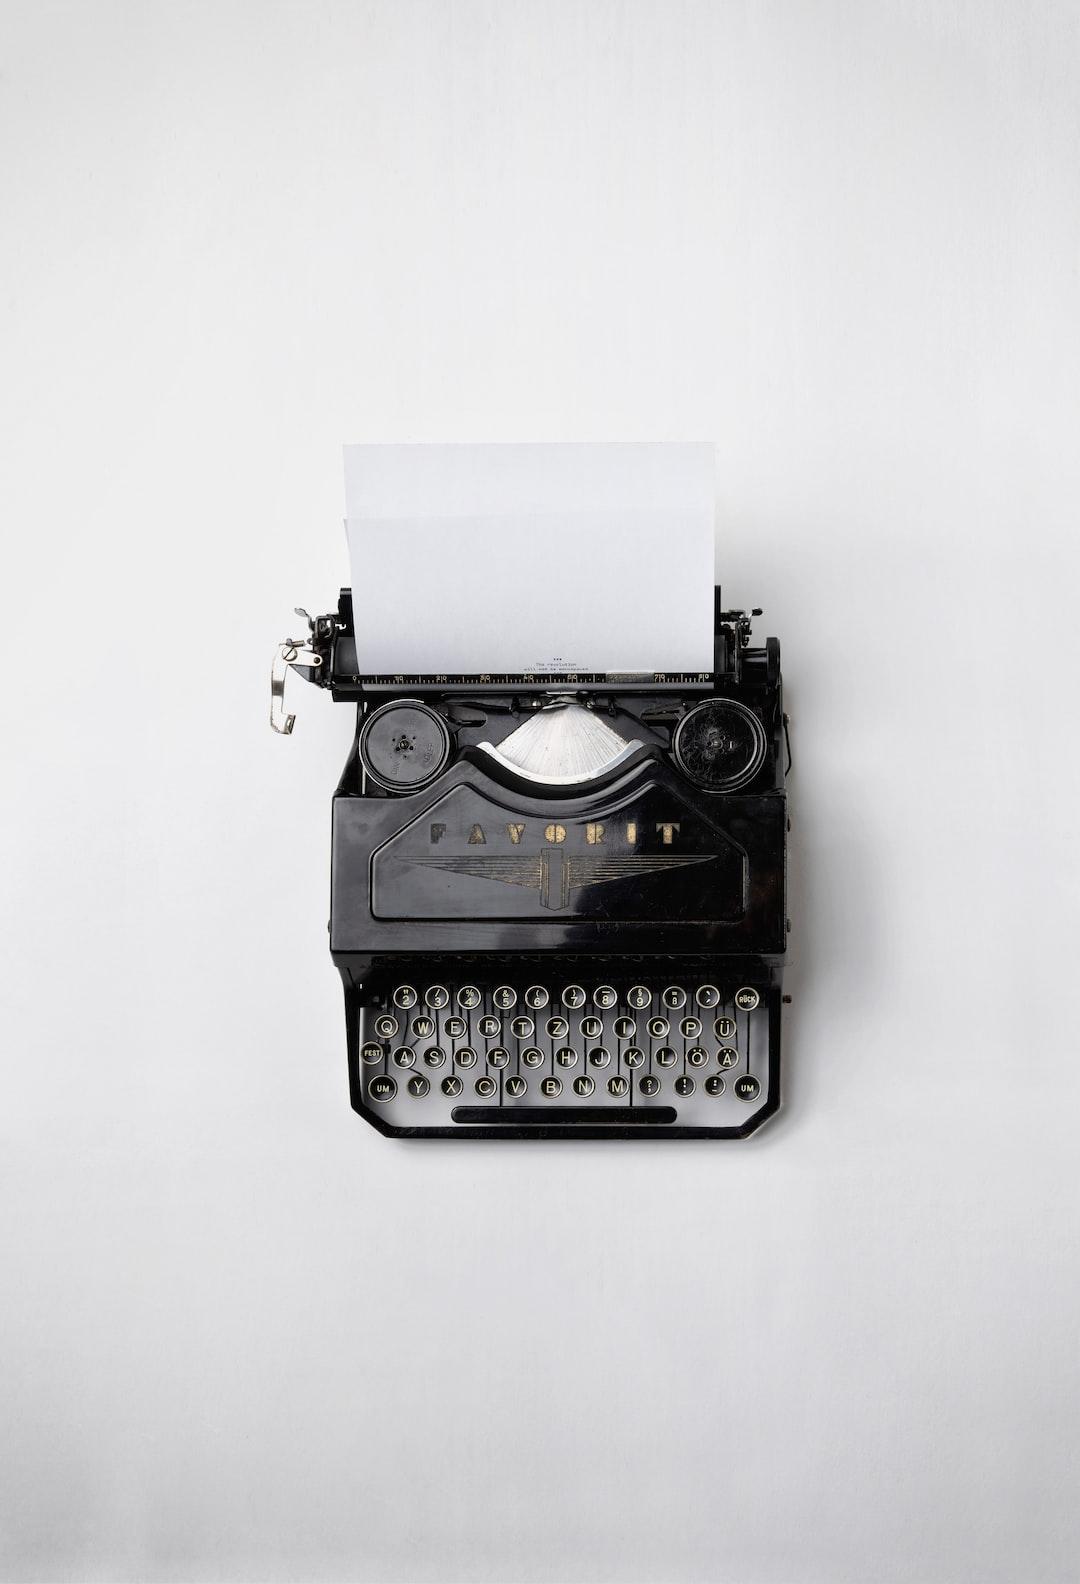 https://images.unsplash.com/reserve/LJIZlzHgQ7WPSh5KVTCB_Typewriter.jpg?ixlib=rb-0.3